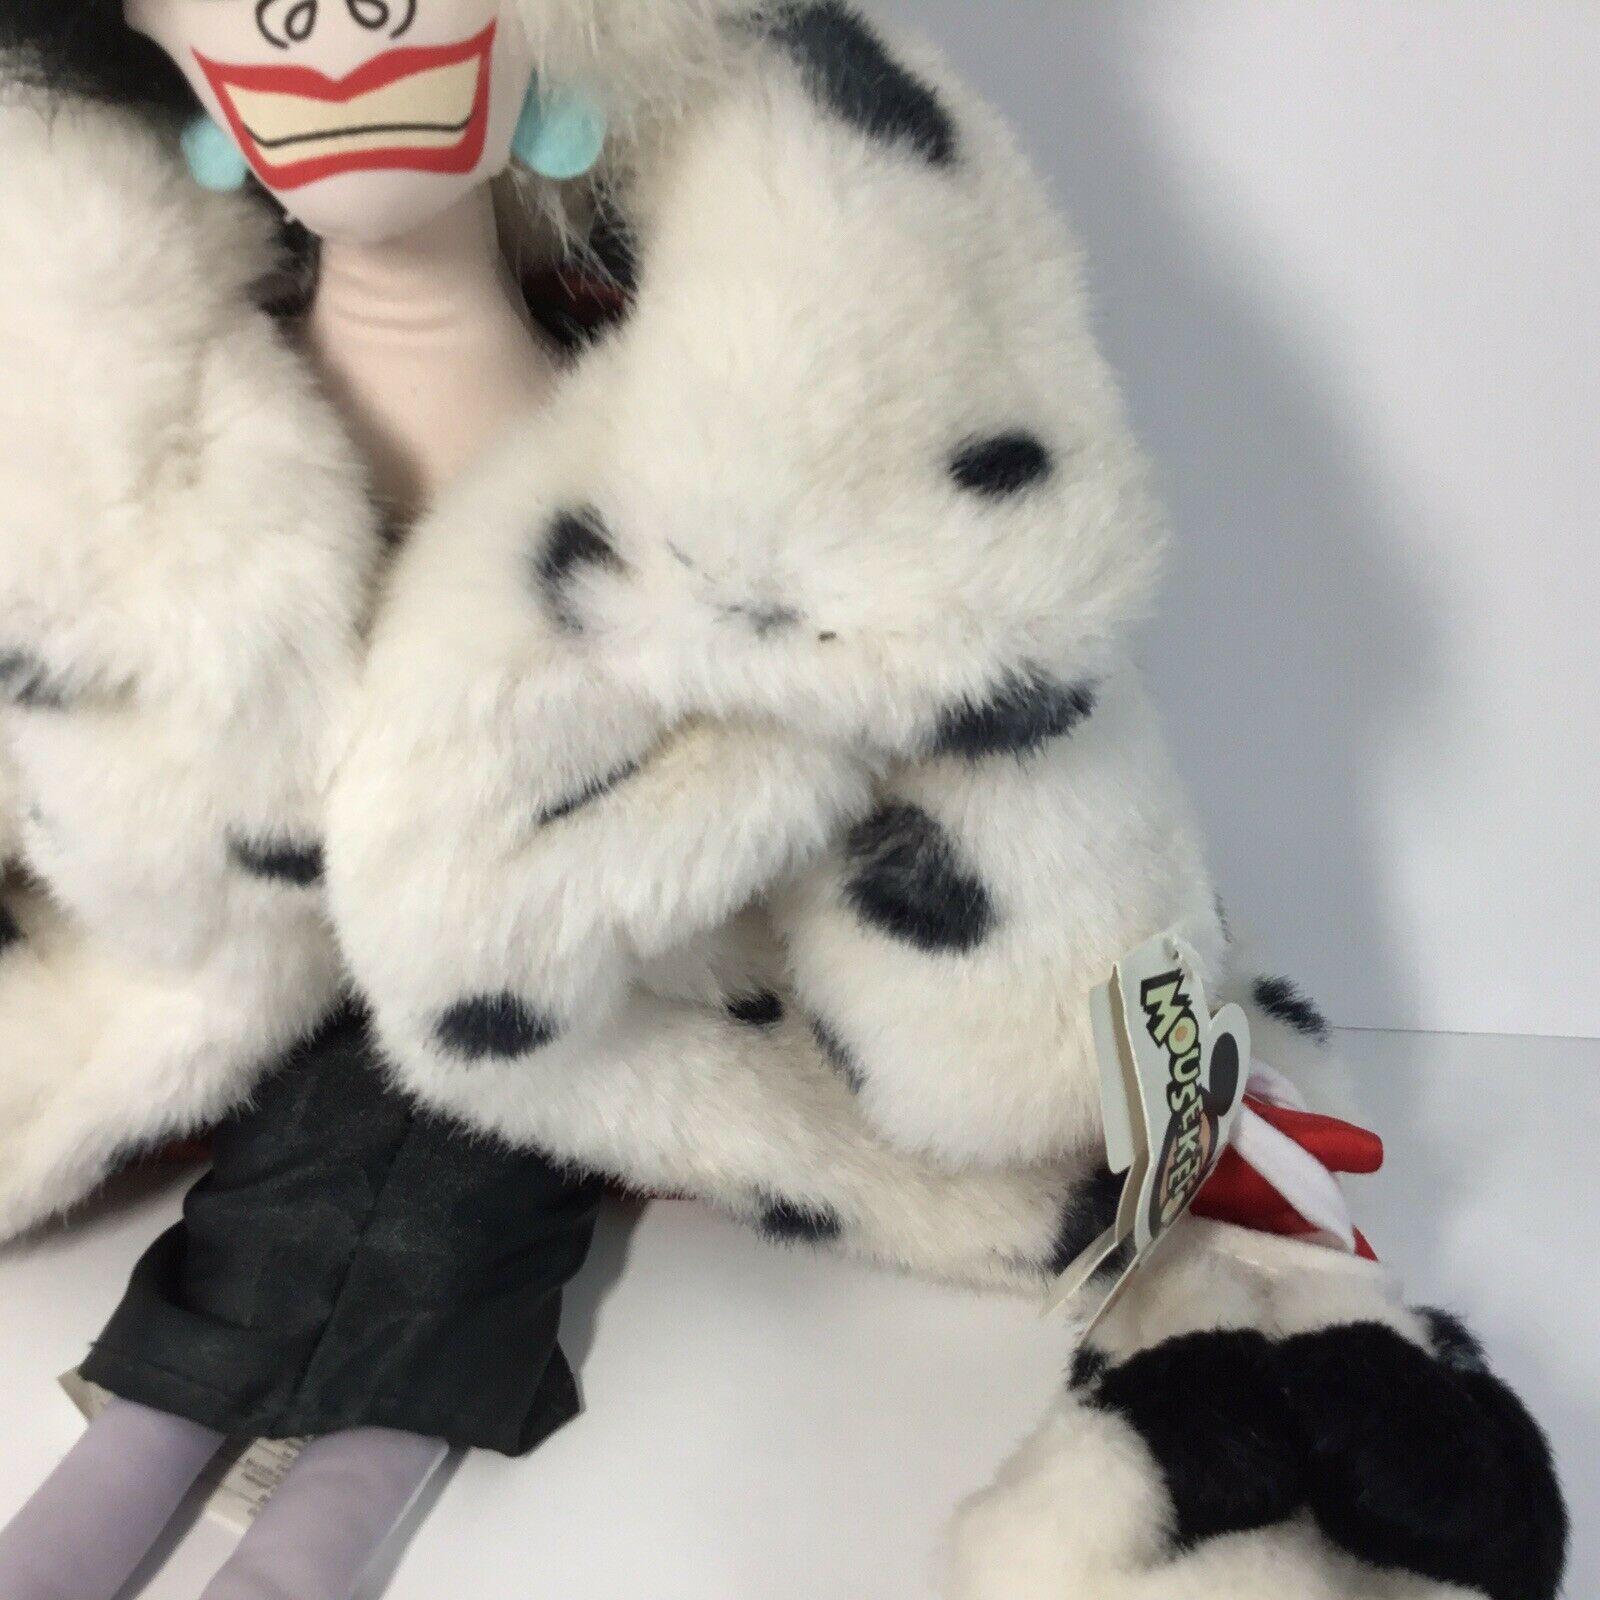 "Disney 101 Dalmatians Villain Plush CRUELLA DE VIL Doll -- 18"" H image 4"